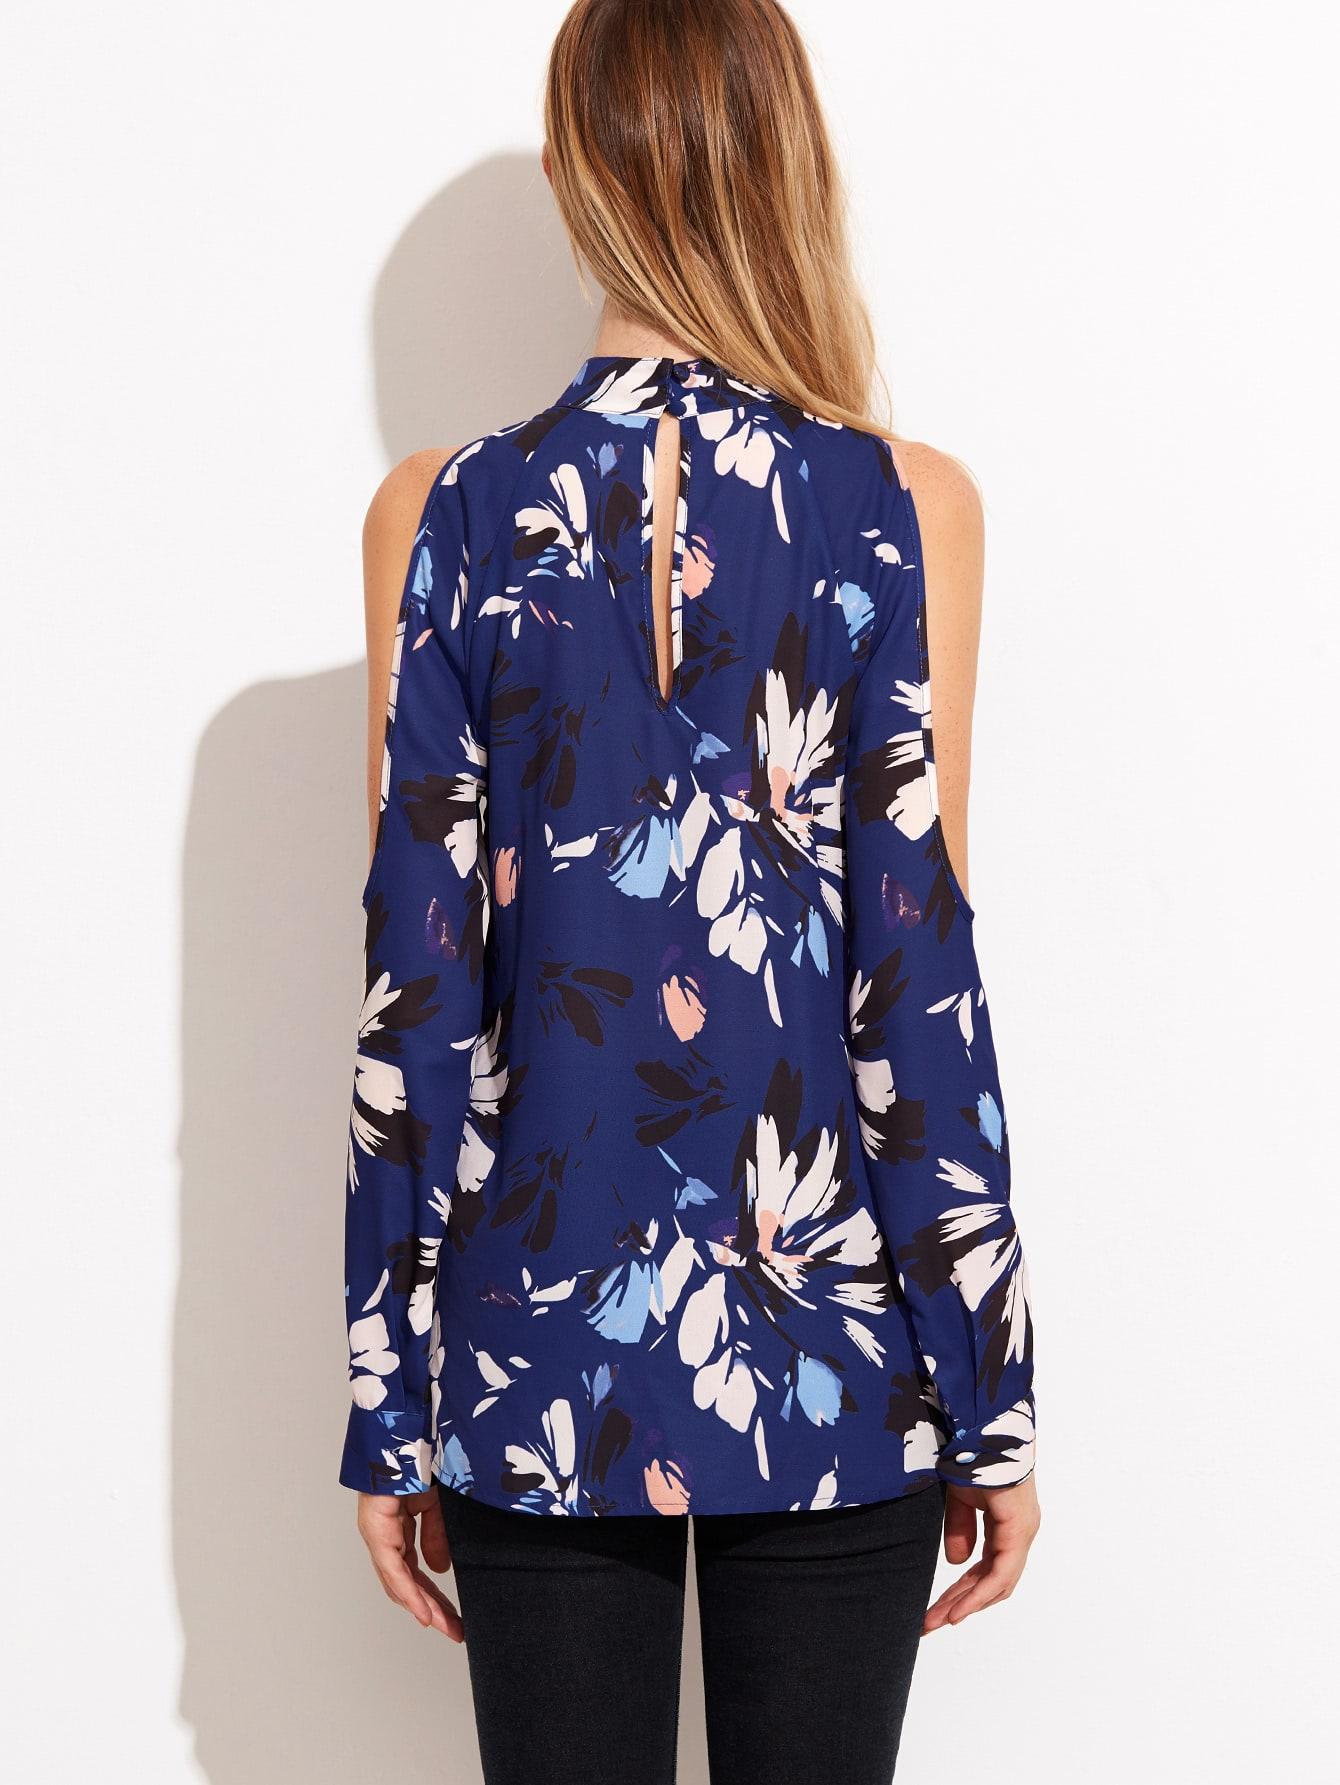 blouse160906504_2